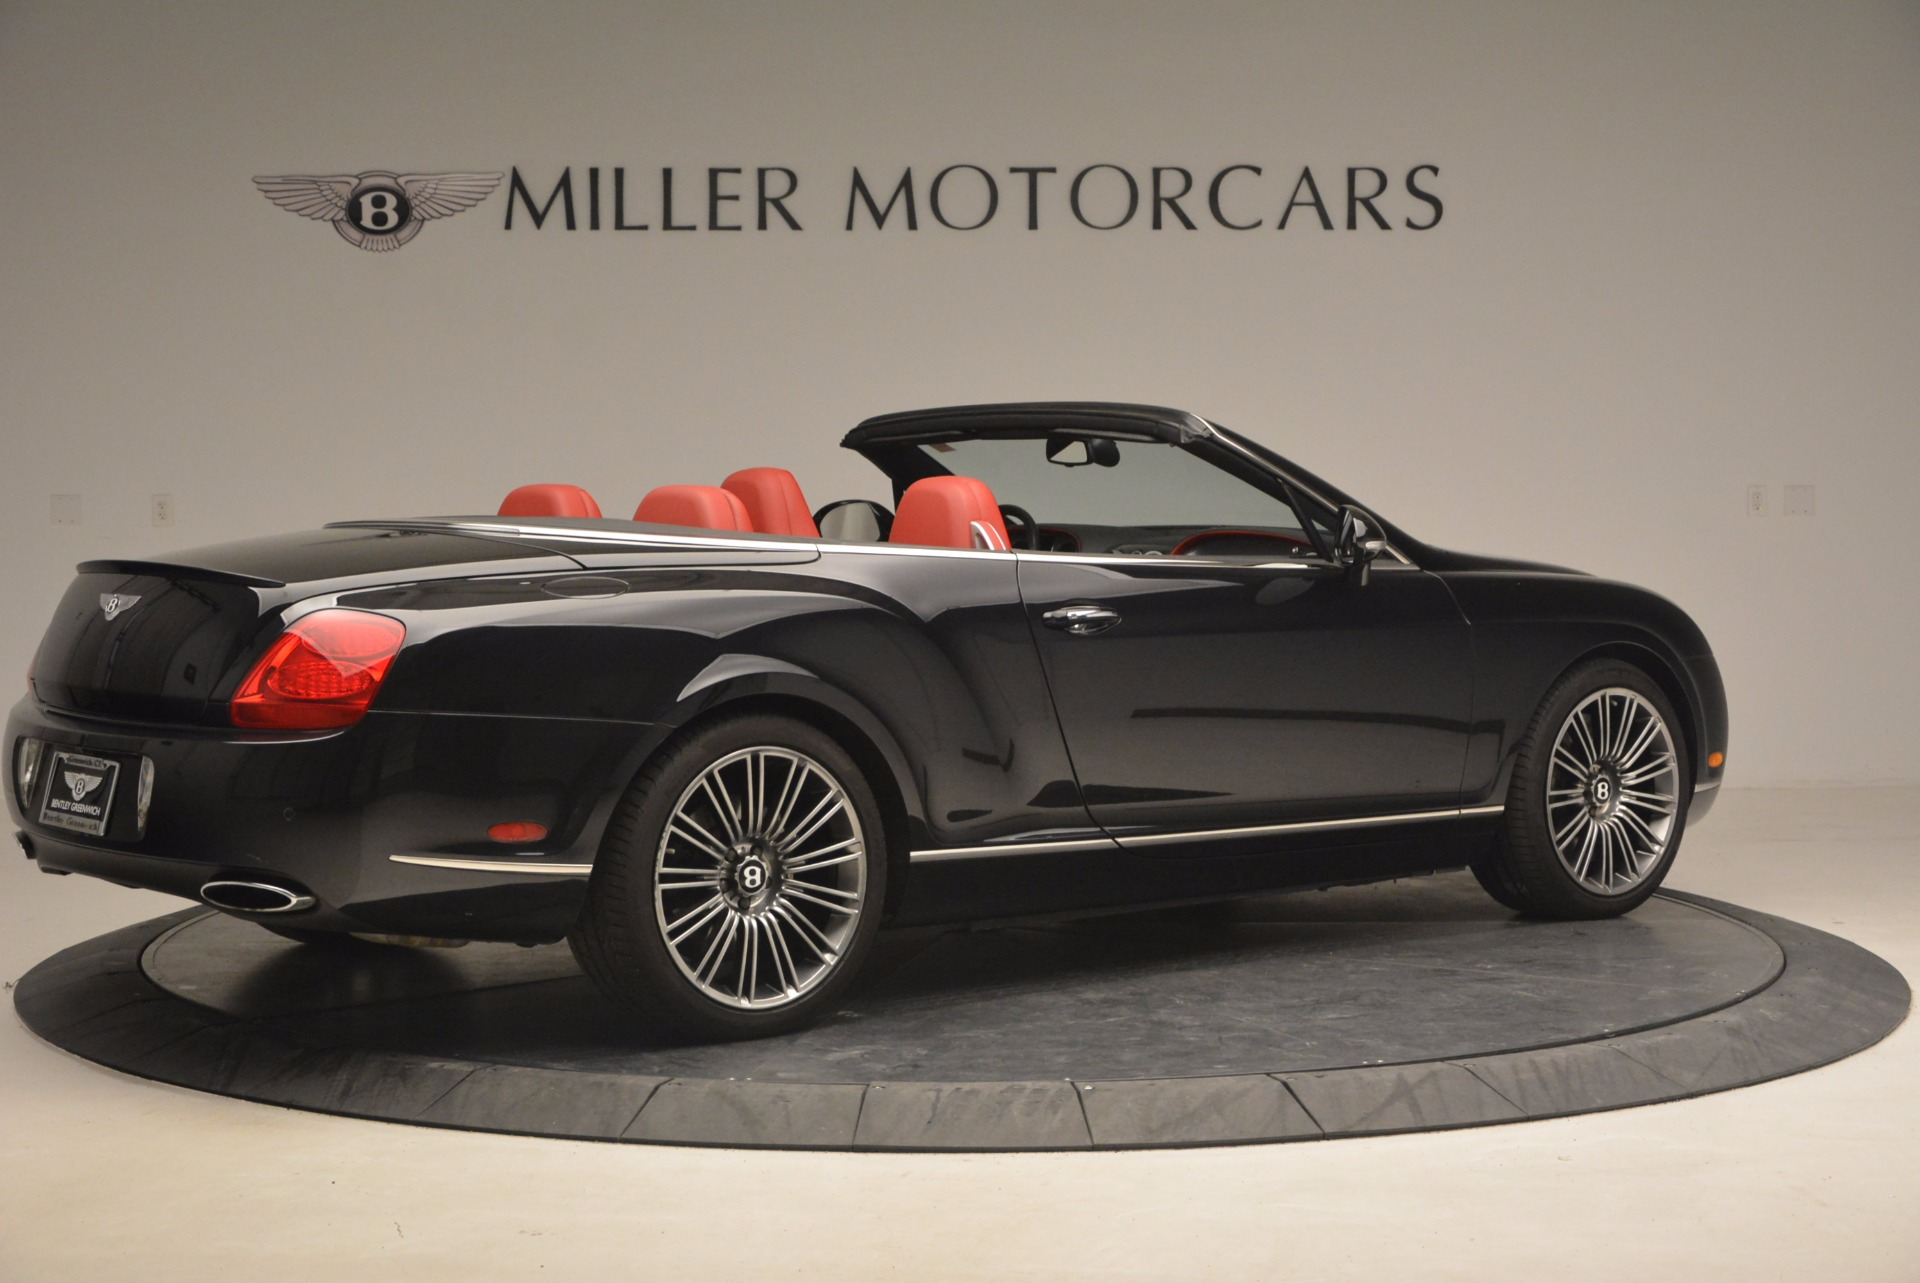 Used 2010 Bentley Continental GT Speed For Sale In Westport, CT 1298_p8